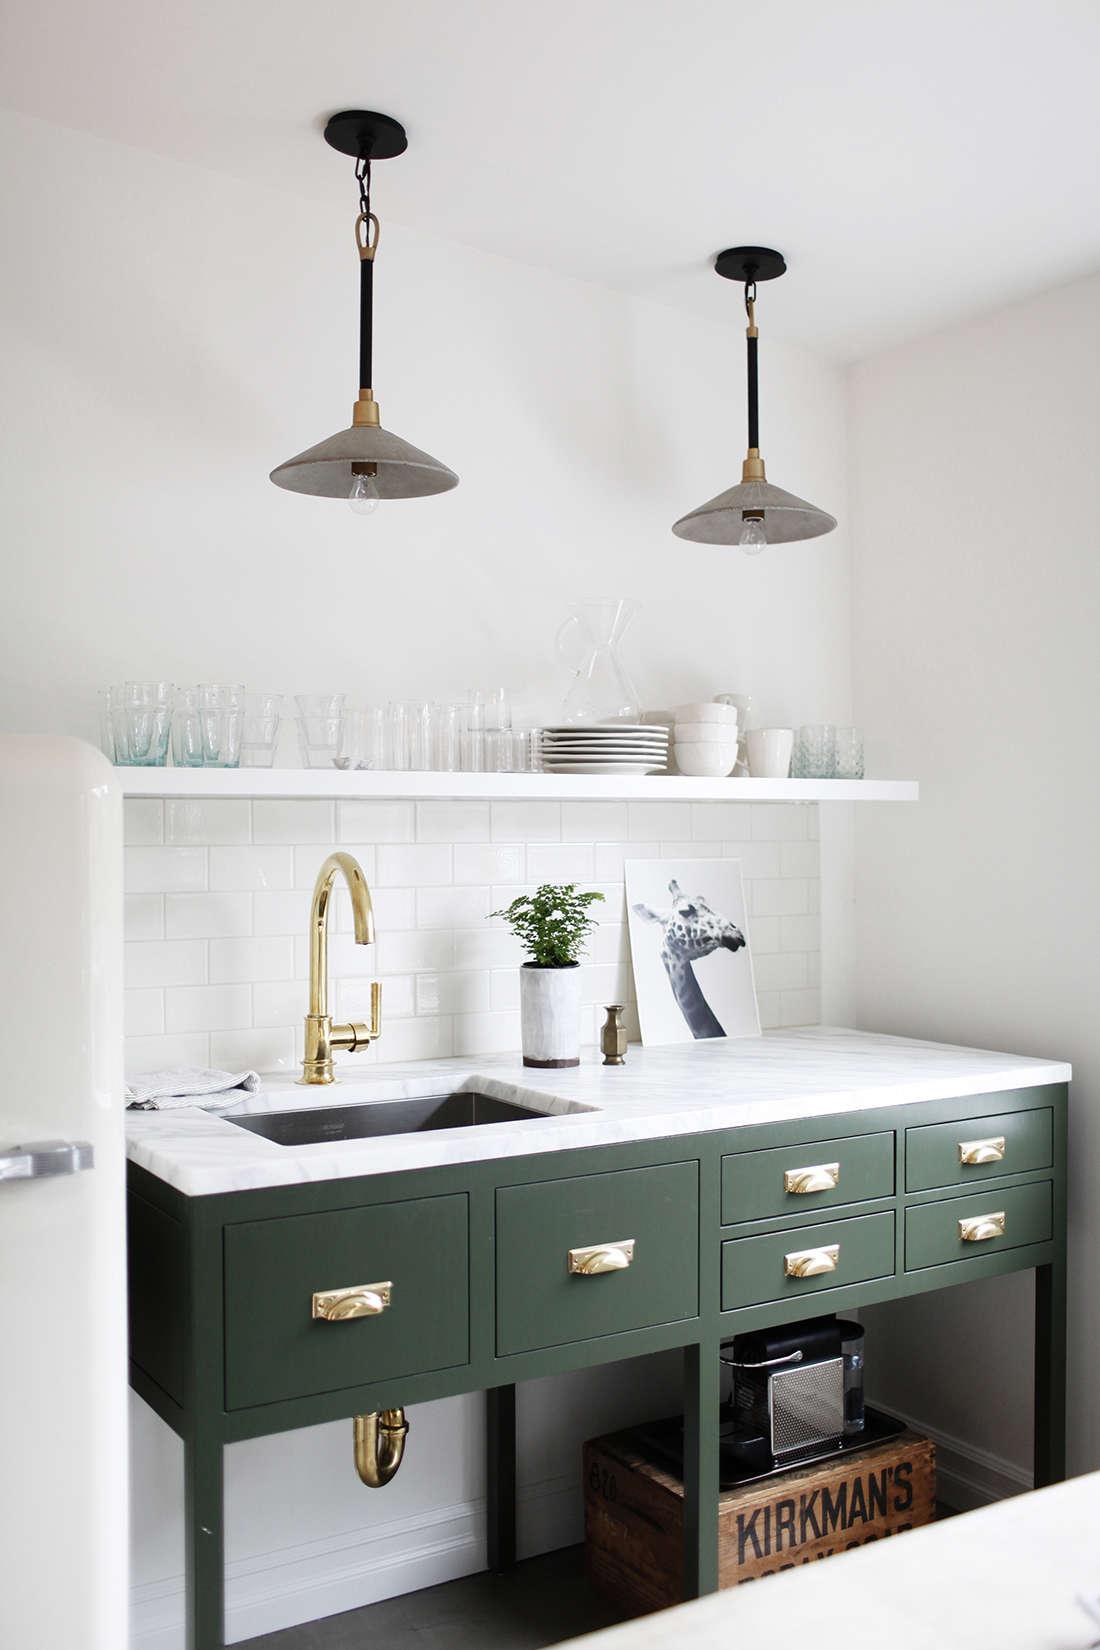 h2 design + build office in seattle | remodelista 10